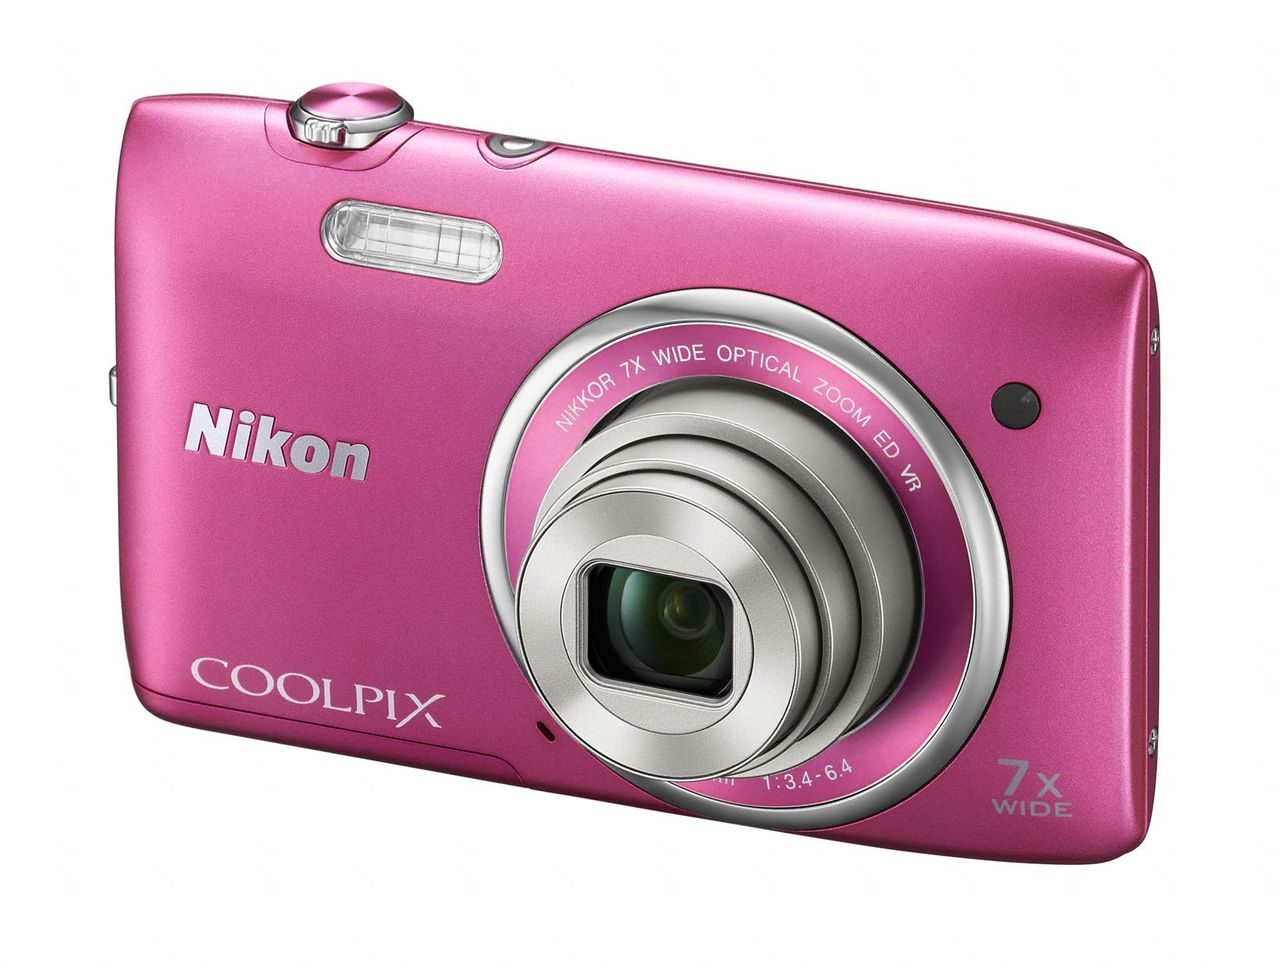 Nikon lanserar S3500